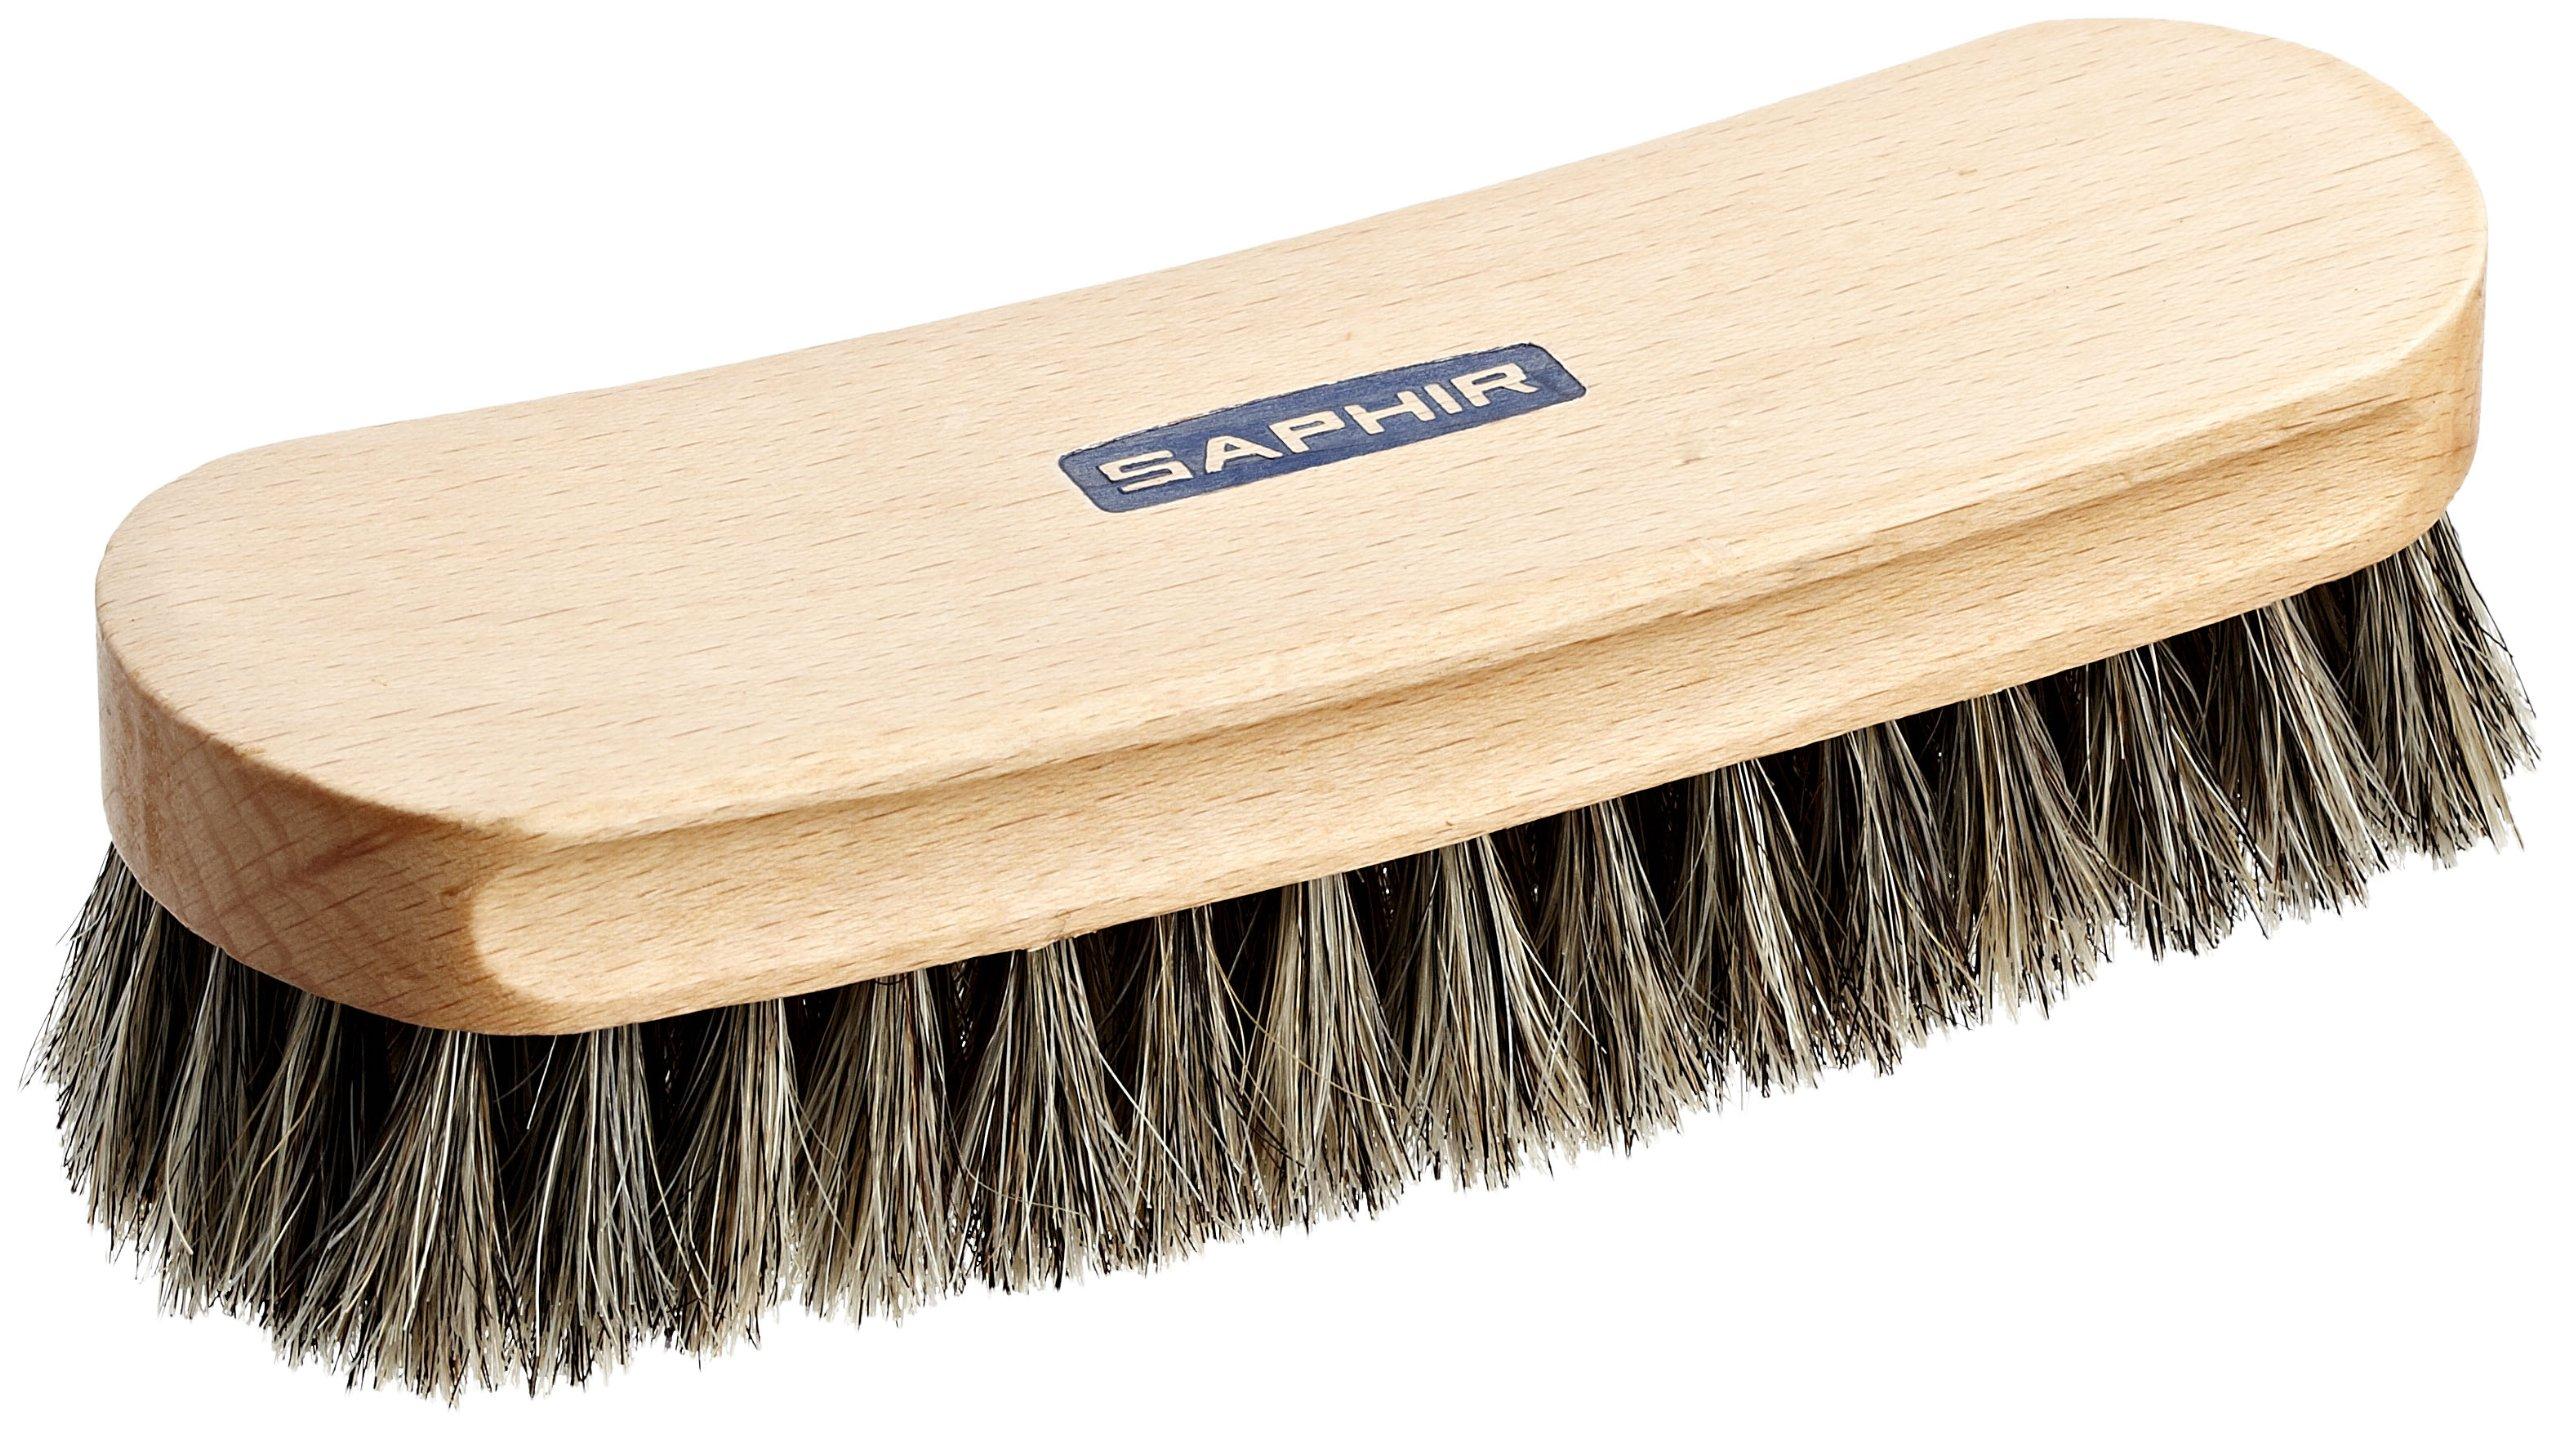 Saphir 7'' Natural Horsehair Brush (18cm) by Saphir (Image #2)